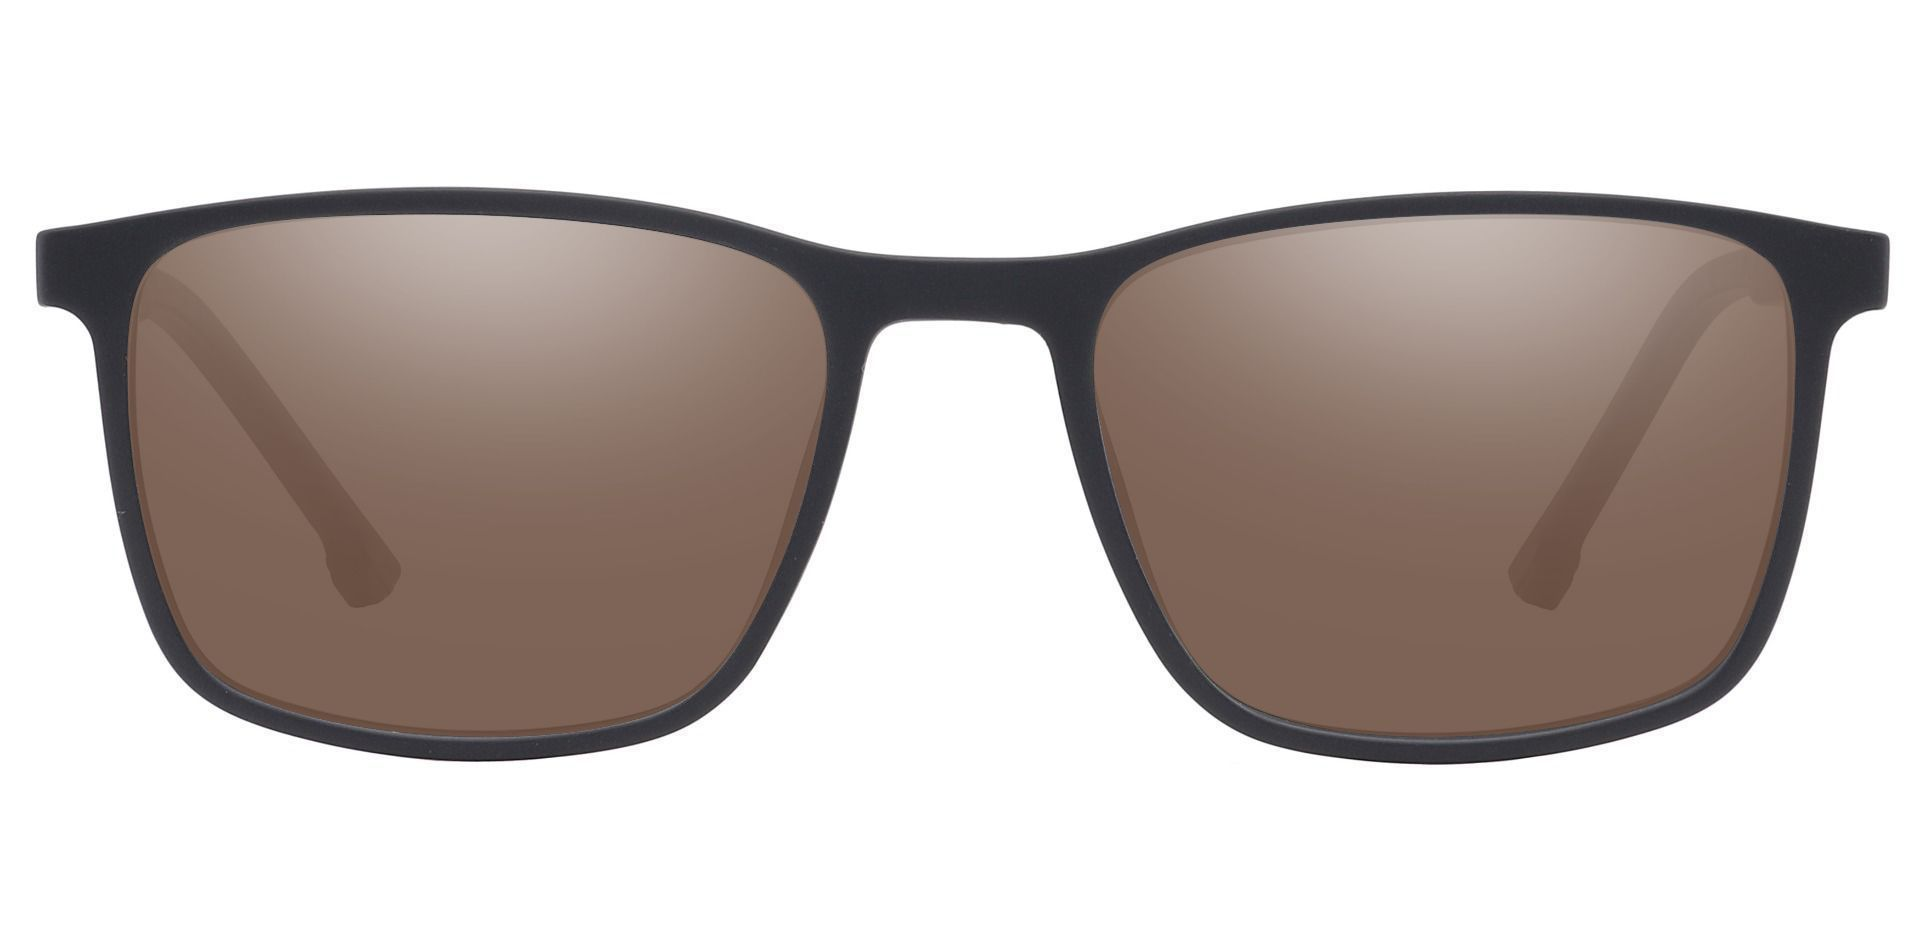 Franklin Rectangle Prescription Sunglasses - Black Frame With Brown Lenses